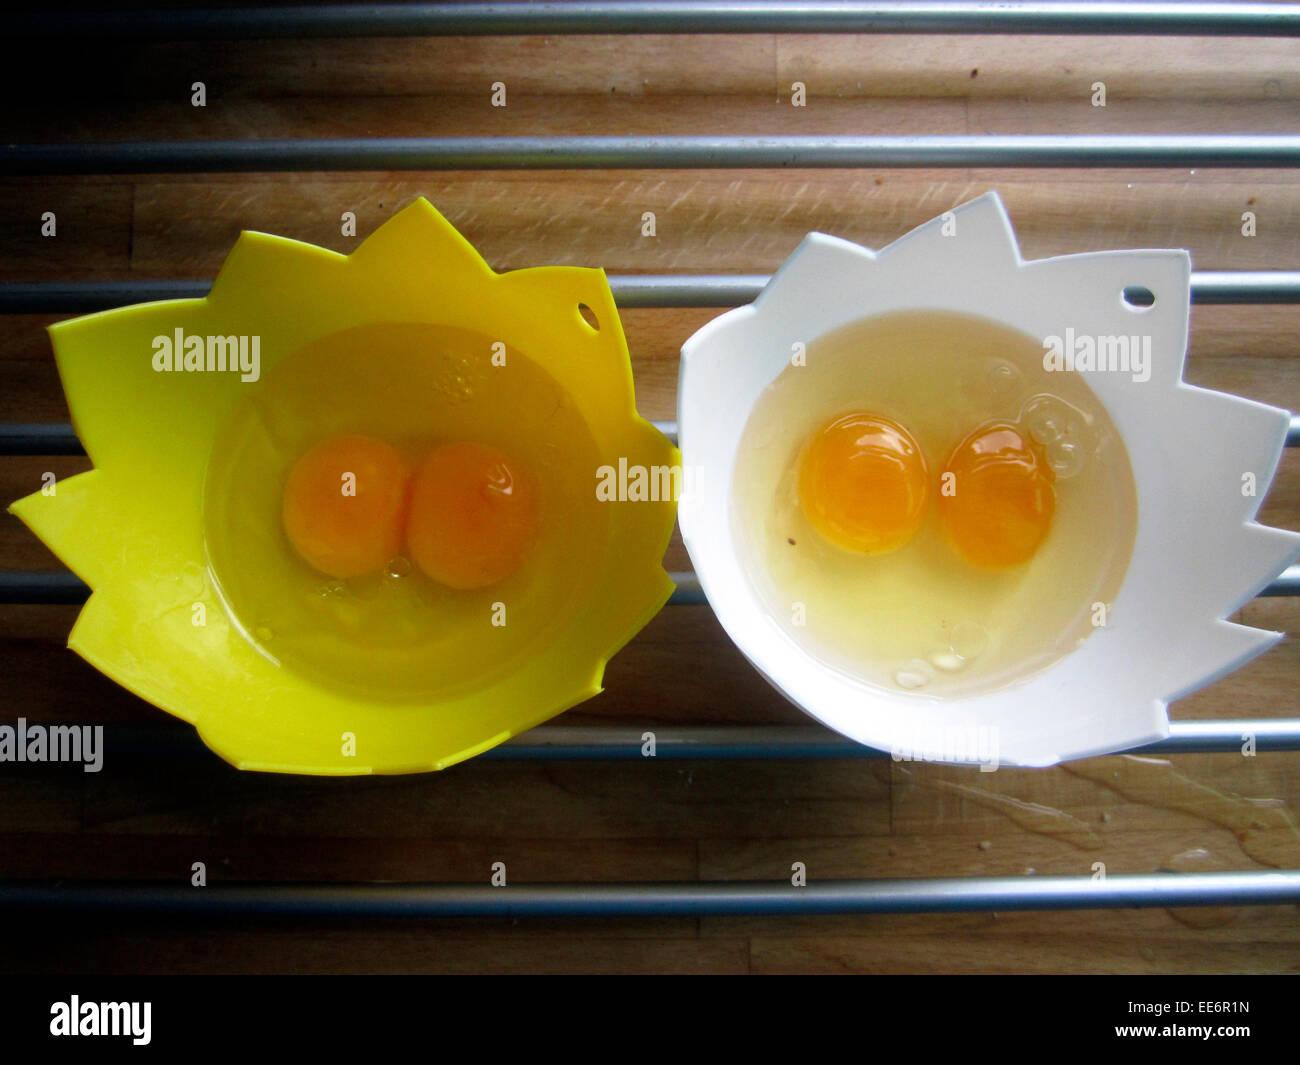 two double yoke eggs in poaching cups - Stock Image